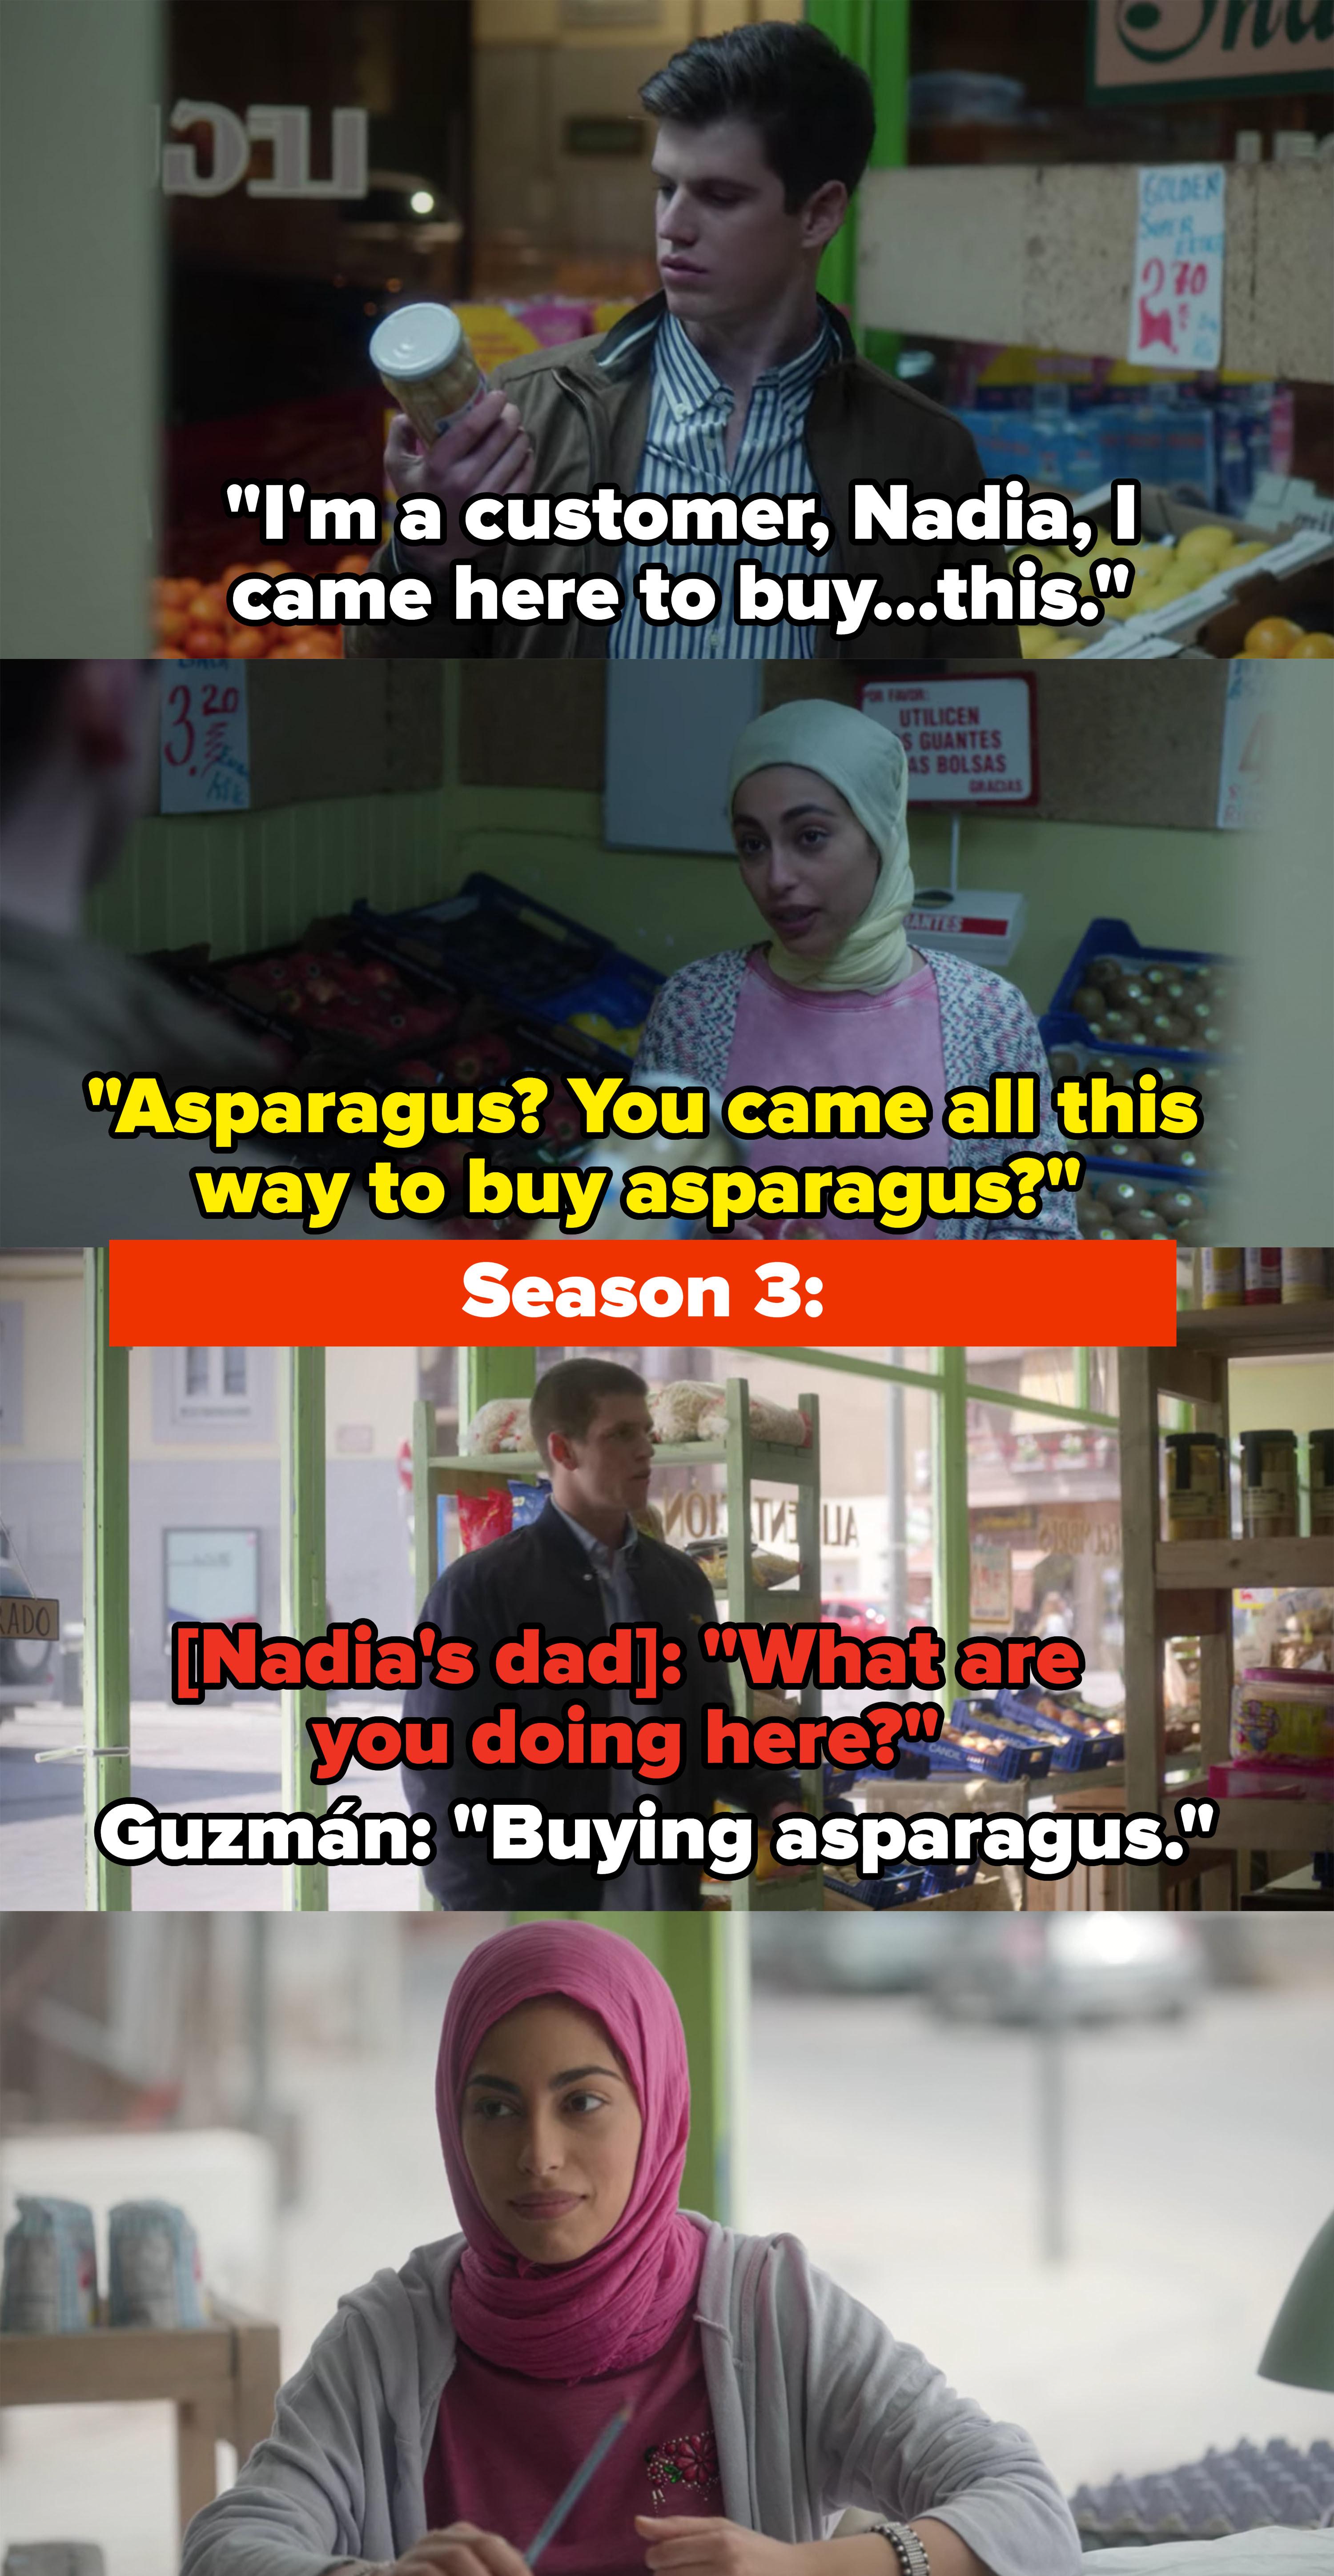 "Season 1: Nadia: ""You came all this way to buy asparagus?"" Season 3: Guzmán says he came to buy asparagus, Nadia smiles"